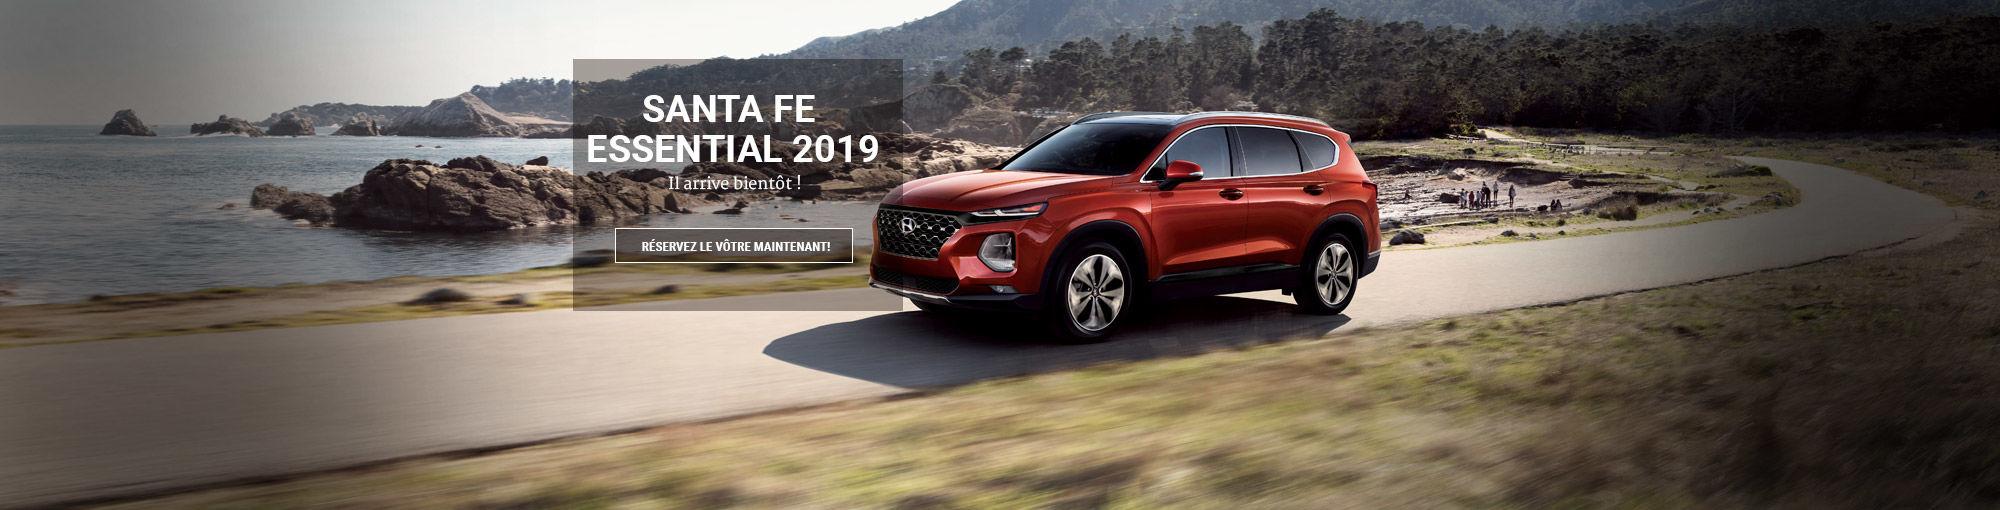 Hyundai Santa Fe 2019 header juillet aout septembre